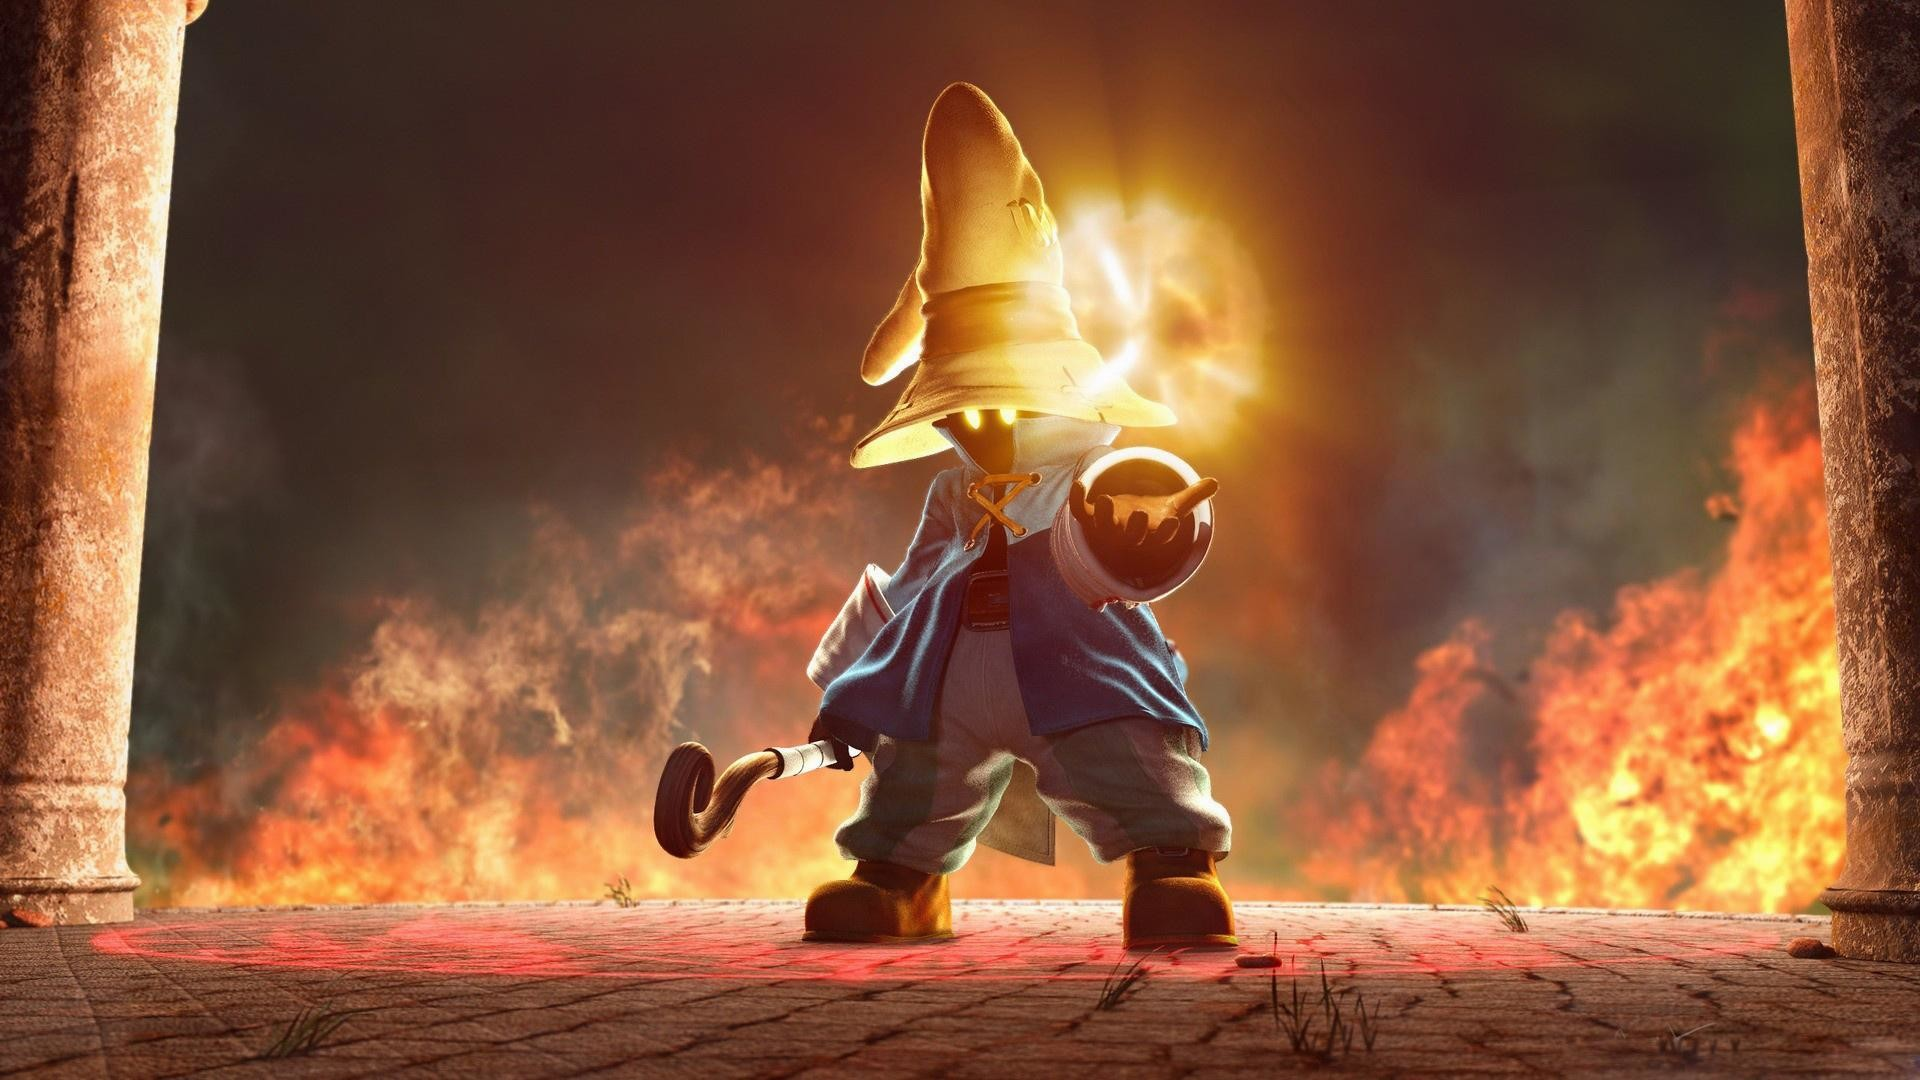 wallpaper.wiki-Download-Final-Fantasy-HD-Wallpapers-PIC-